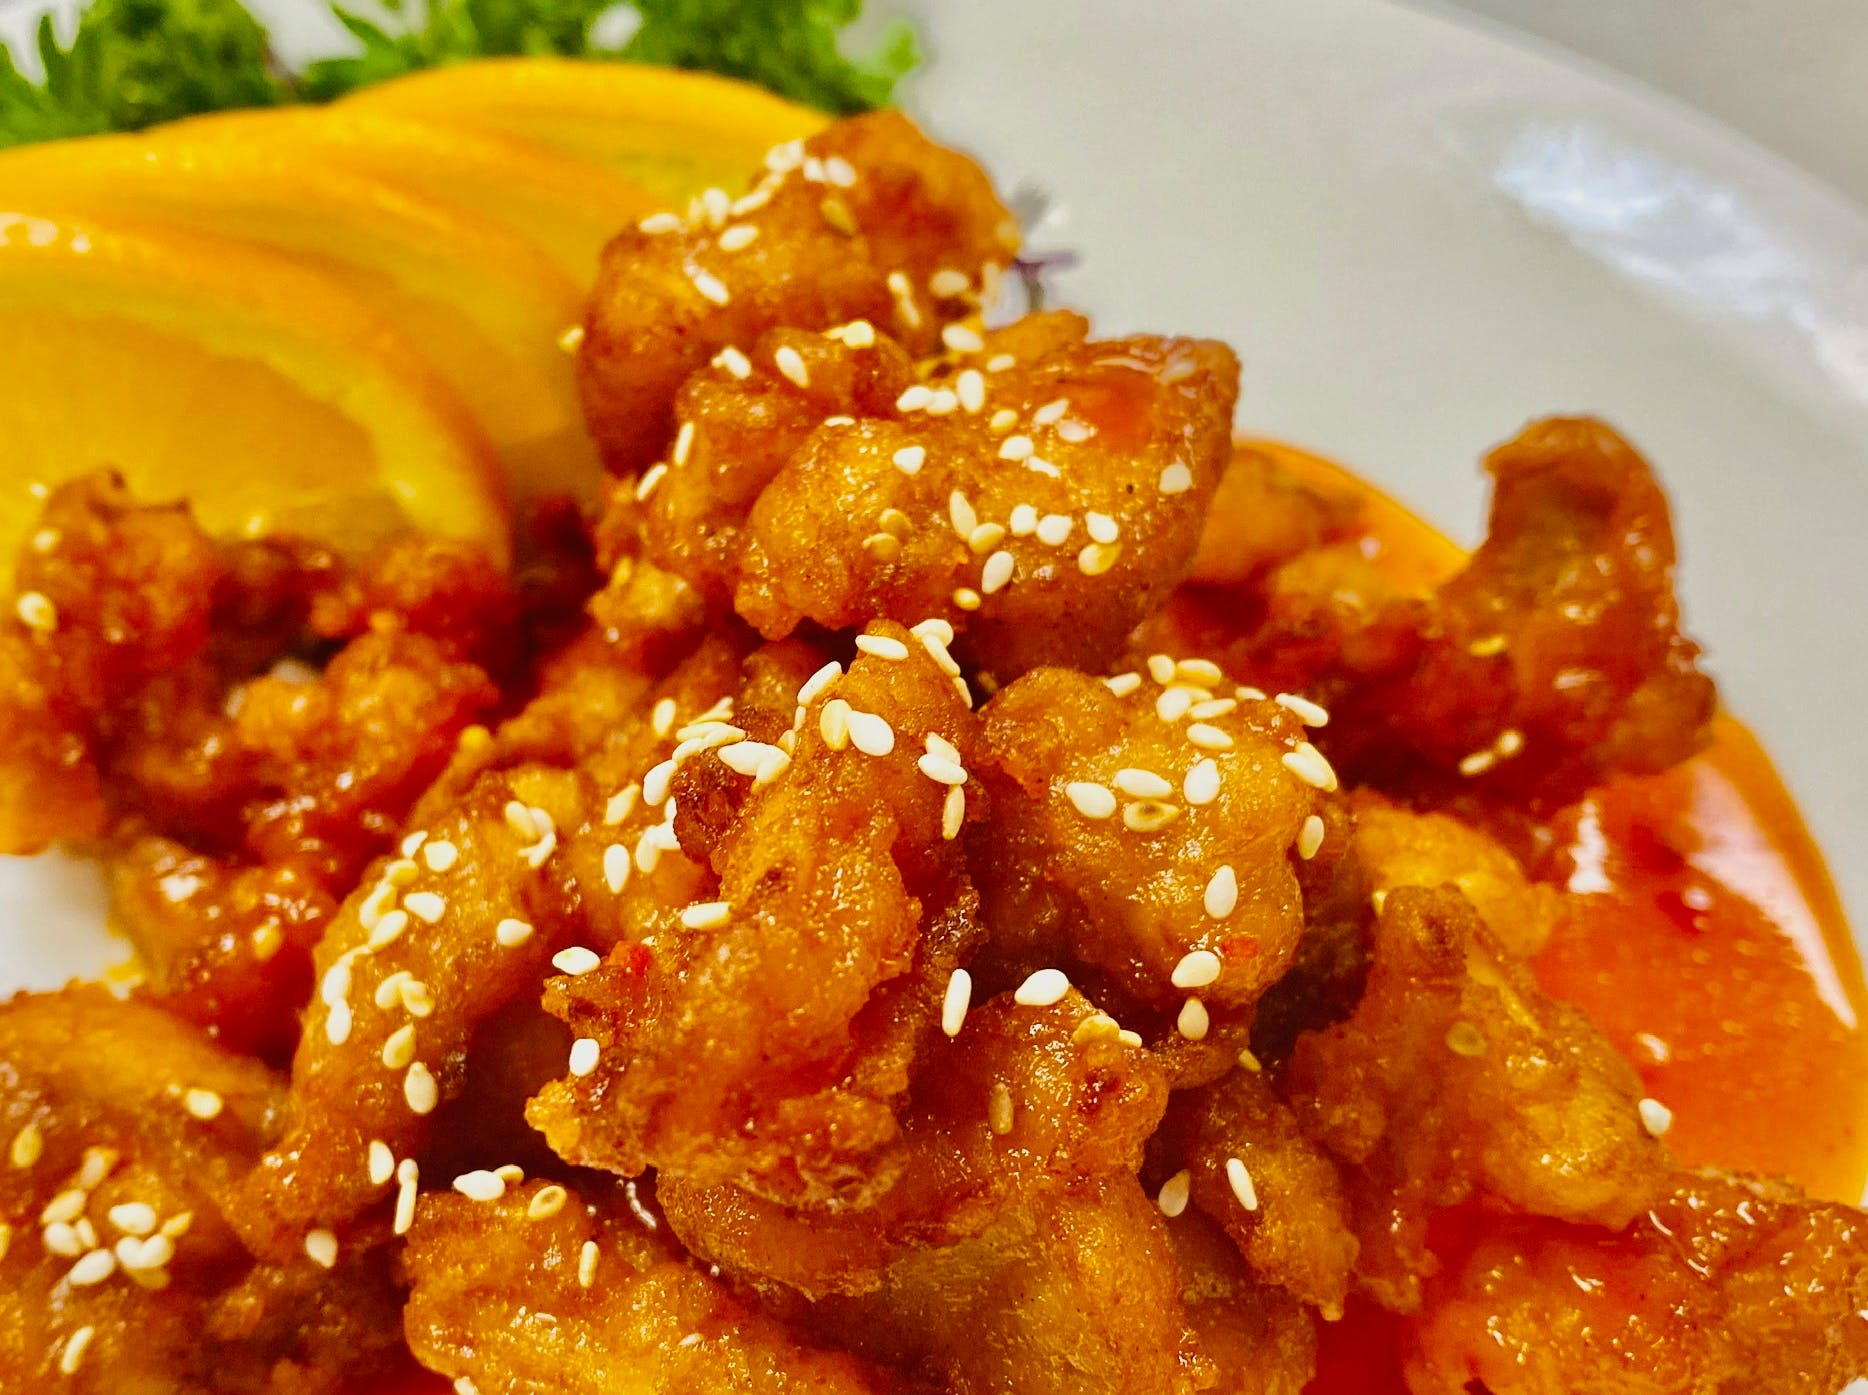 Sesame Chicken Entree from Stir Fry 88 in Green Bay, WI